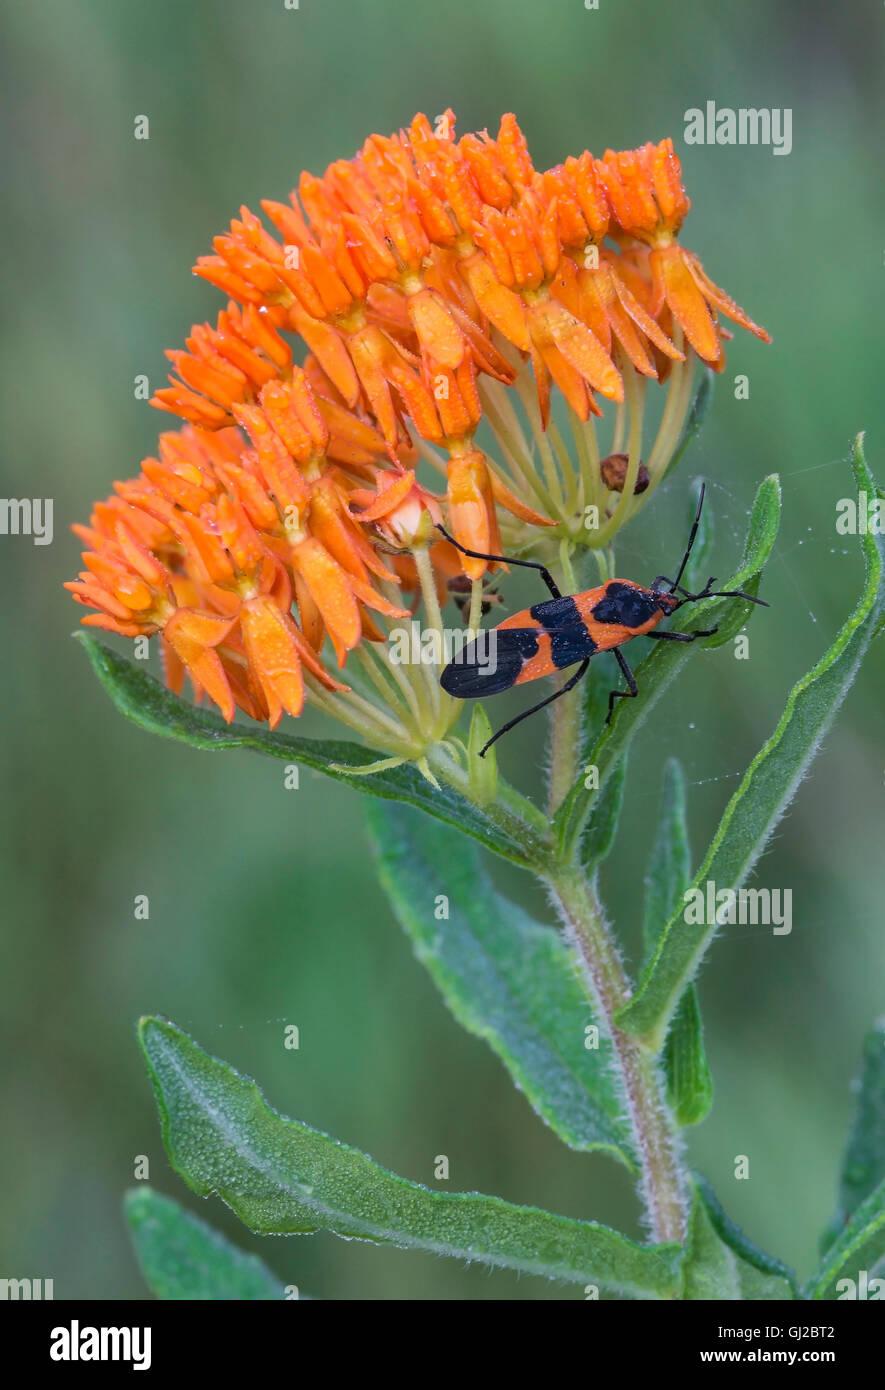 Große Wolfsmilch Bug (Oncopeltus Fasciatus) auf Schmetterling Seidenpflanze (Asclepias Tuberosa) Blumen E USA Stockbild